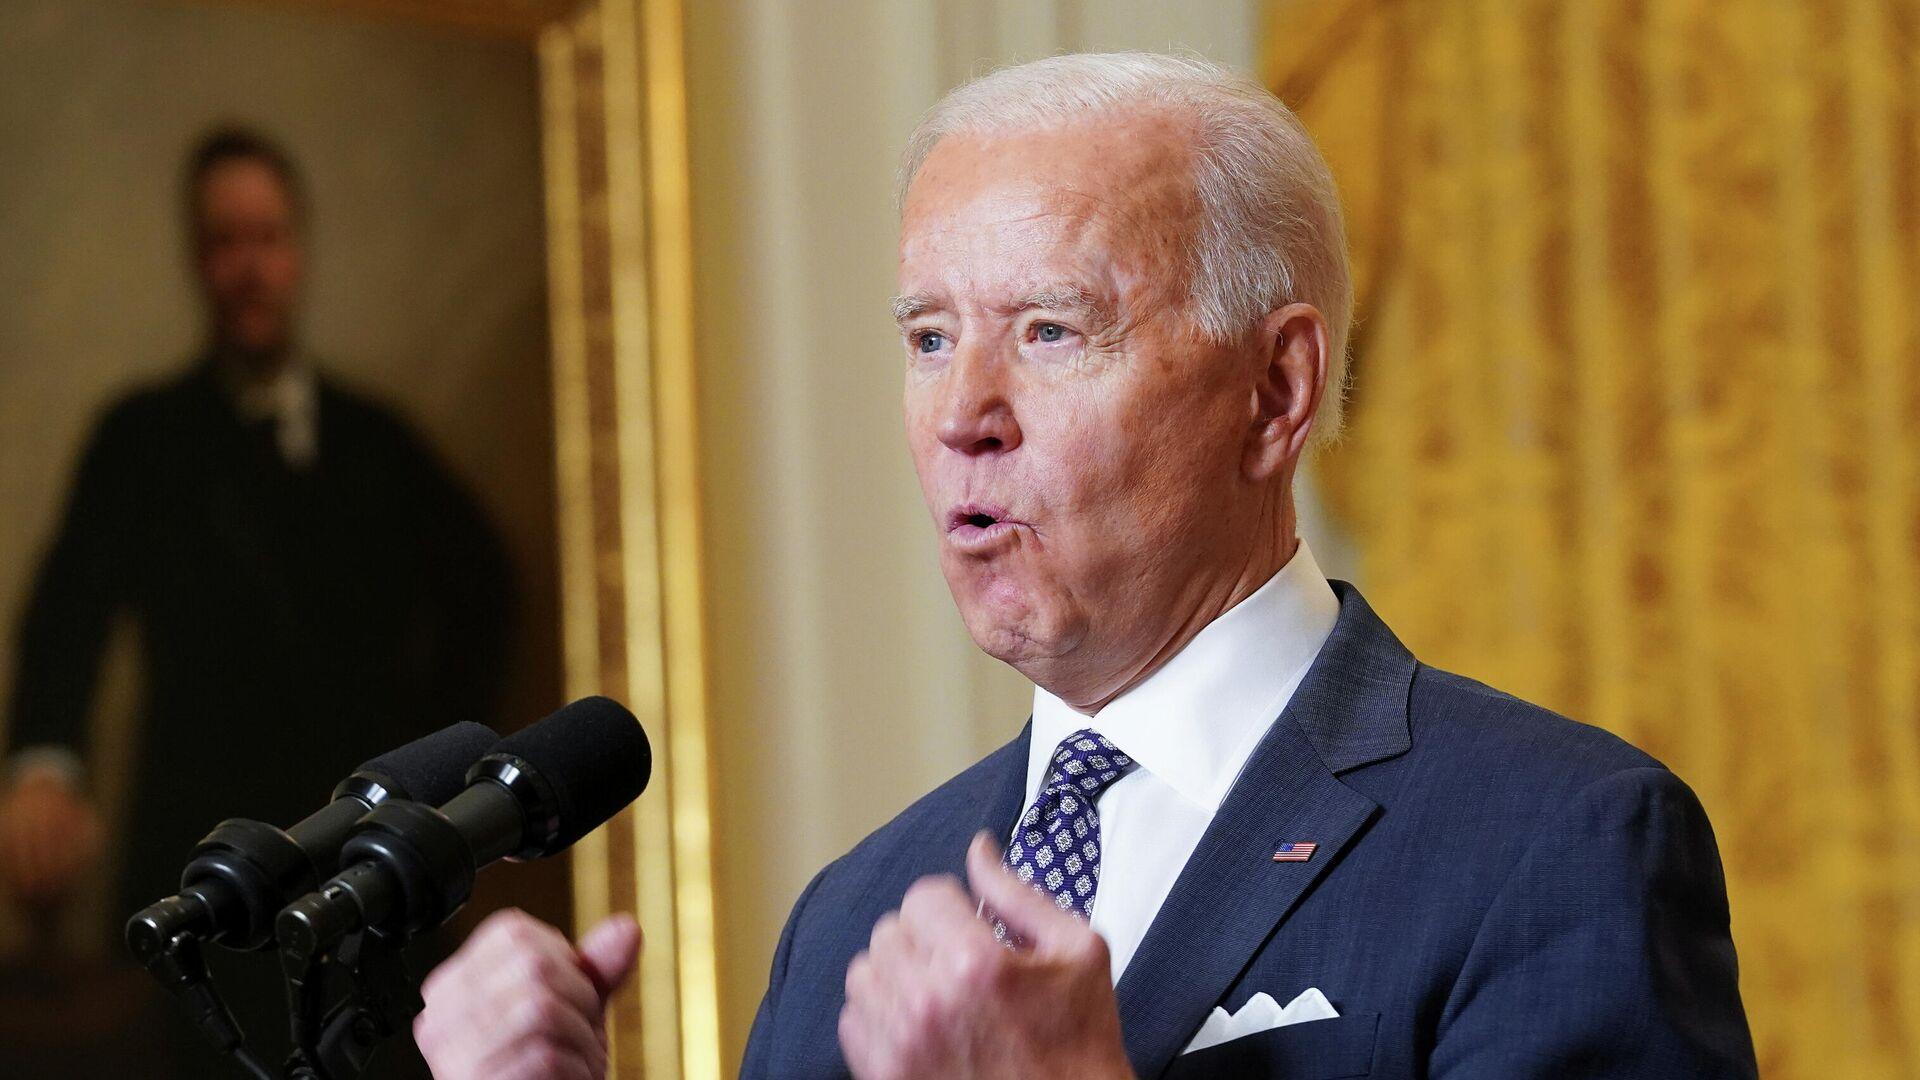 Joe Biden, presidente de EEUU - Sputnik Mundo, 1920, 08.05.2021